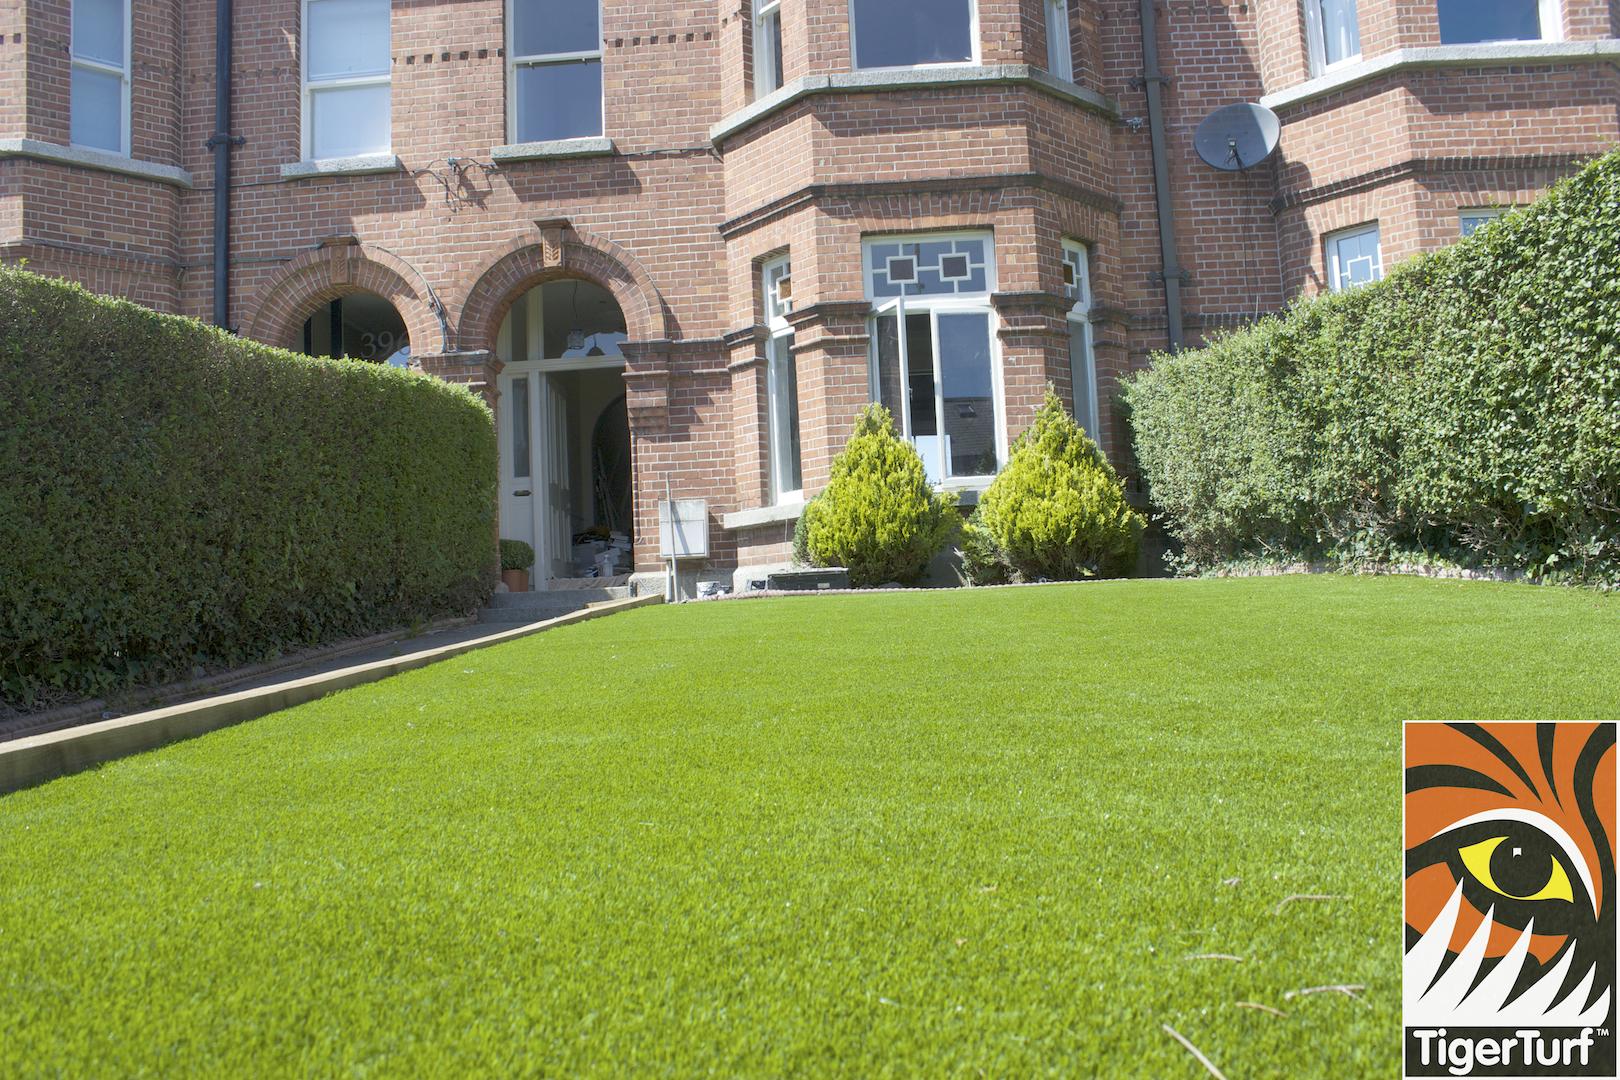 front garden of proper in artificial TigerTurf Lawn